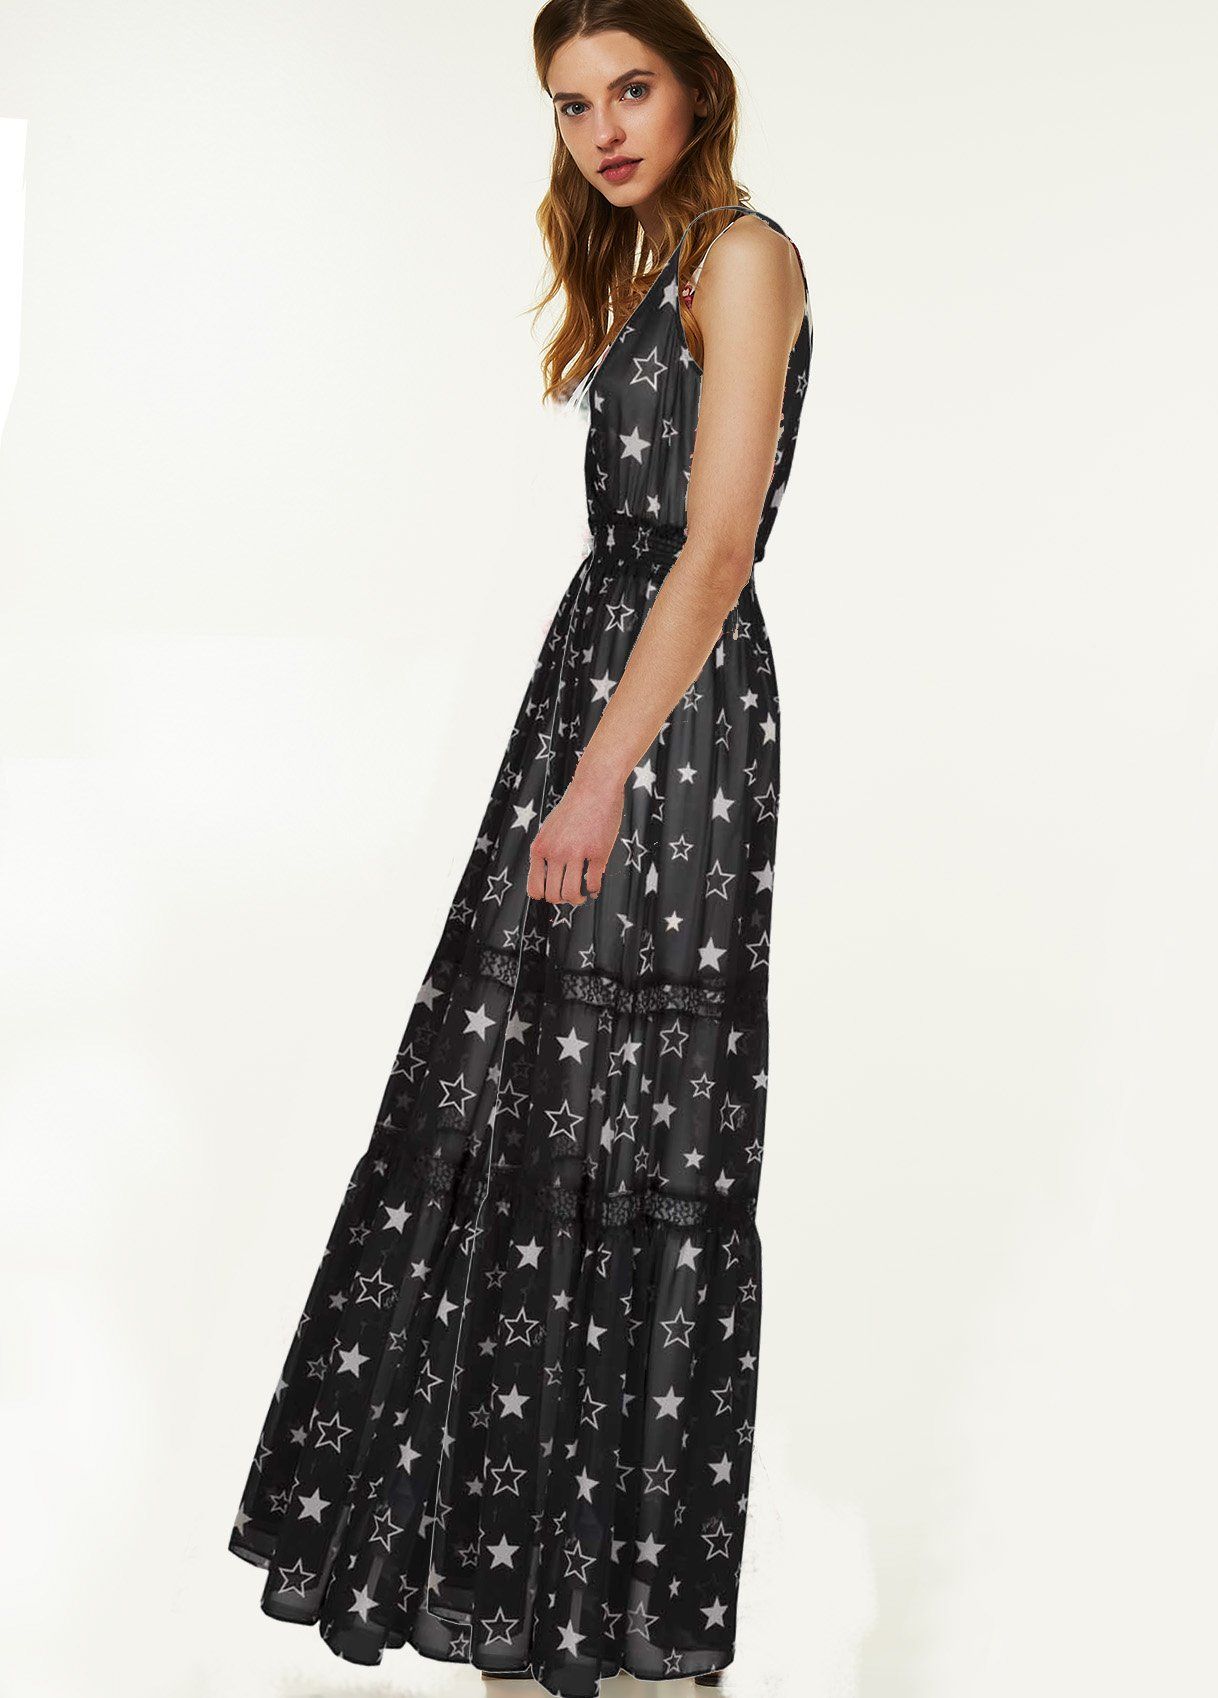 premium selection 1ac6f 3166d Maxi abito 'Elvire' – LIU JO – Shop The Look – Guarda Ama ...